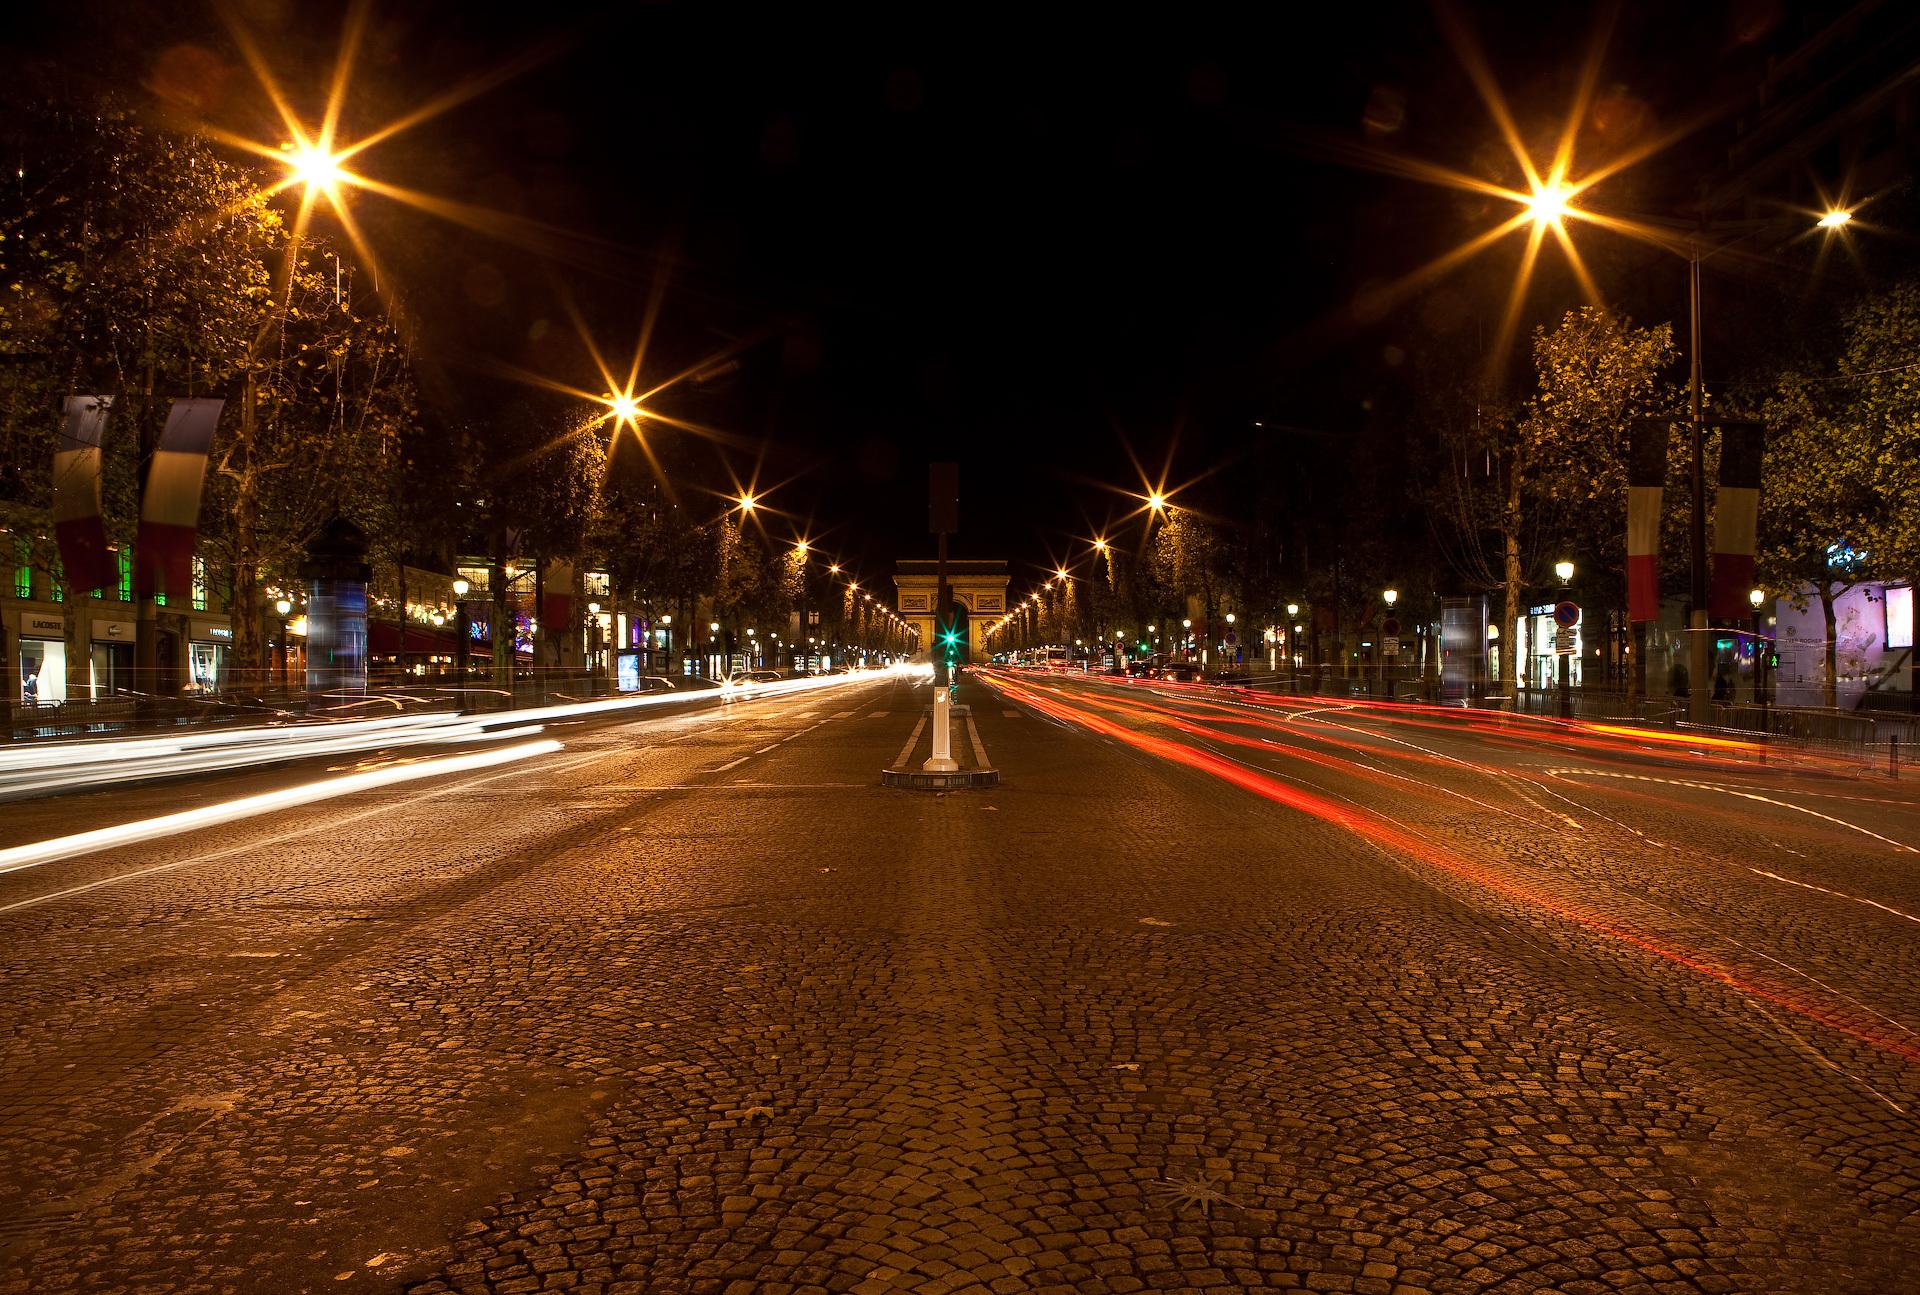 Франция дороги ночь фонари  № 2229321 бесплатно